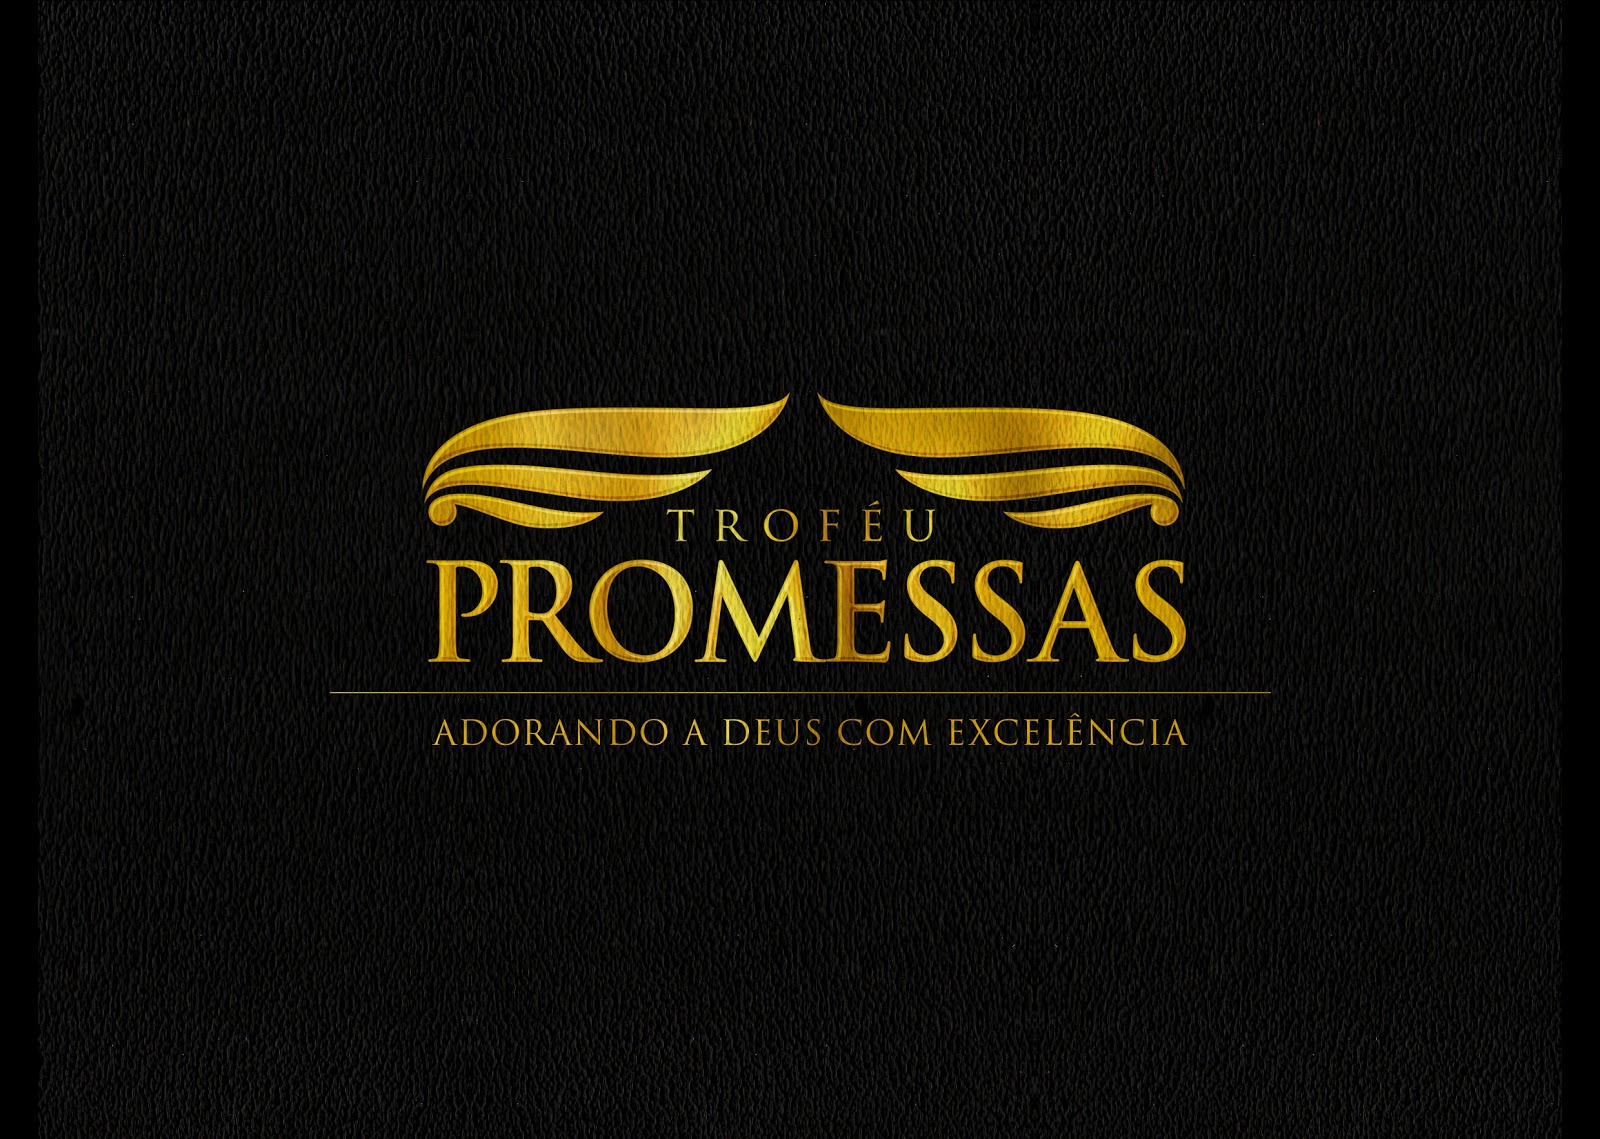 http://1.bp.blogspot.com/-0G1mffaLEcI/Tqny-jjyKEI/AAAAAAAABMQ/gE8ObsIBzvs/s1600/logo_trofeu_promessas.jpg